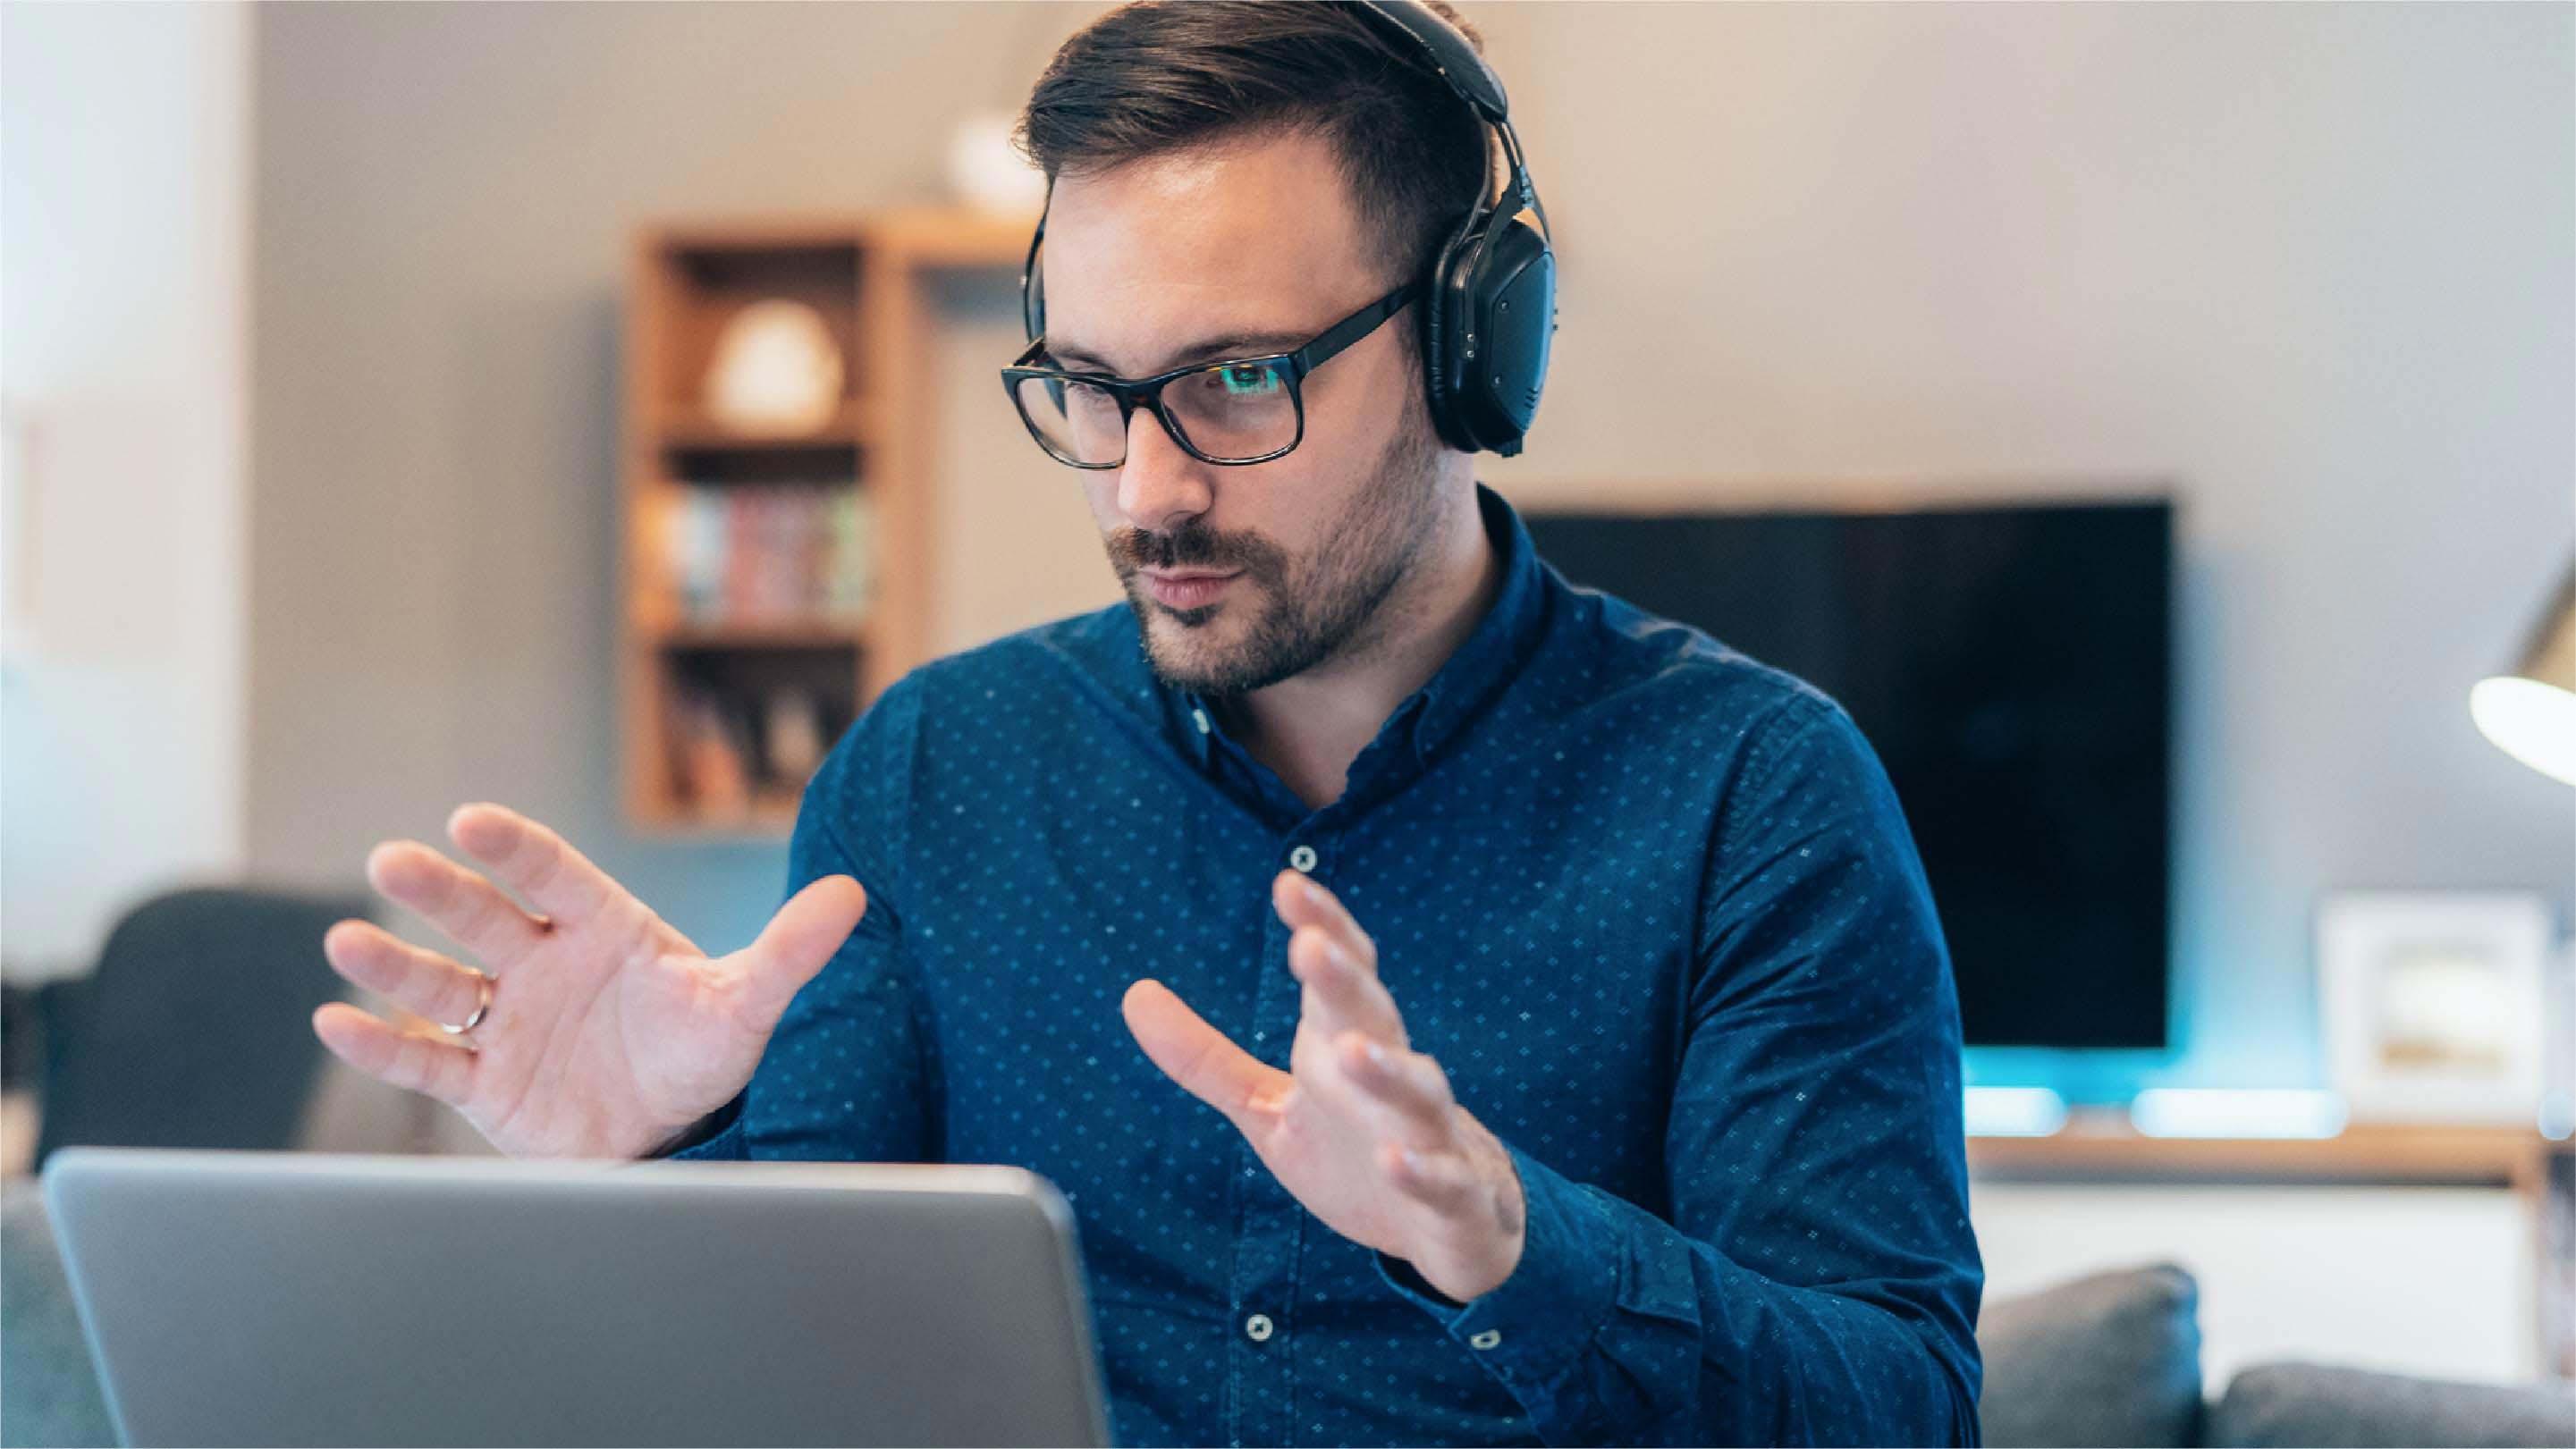 Man explaining something during a virtual interview